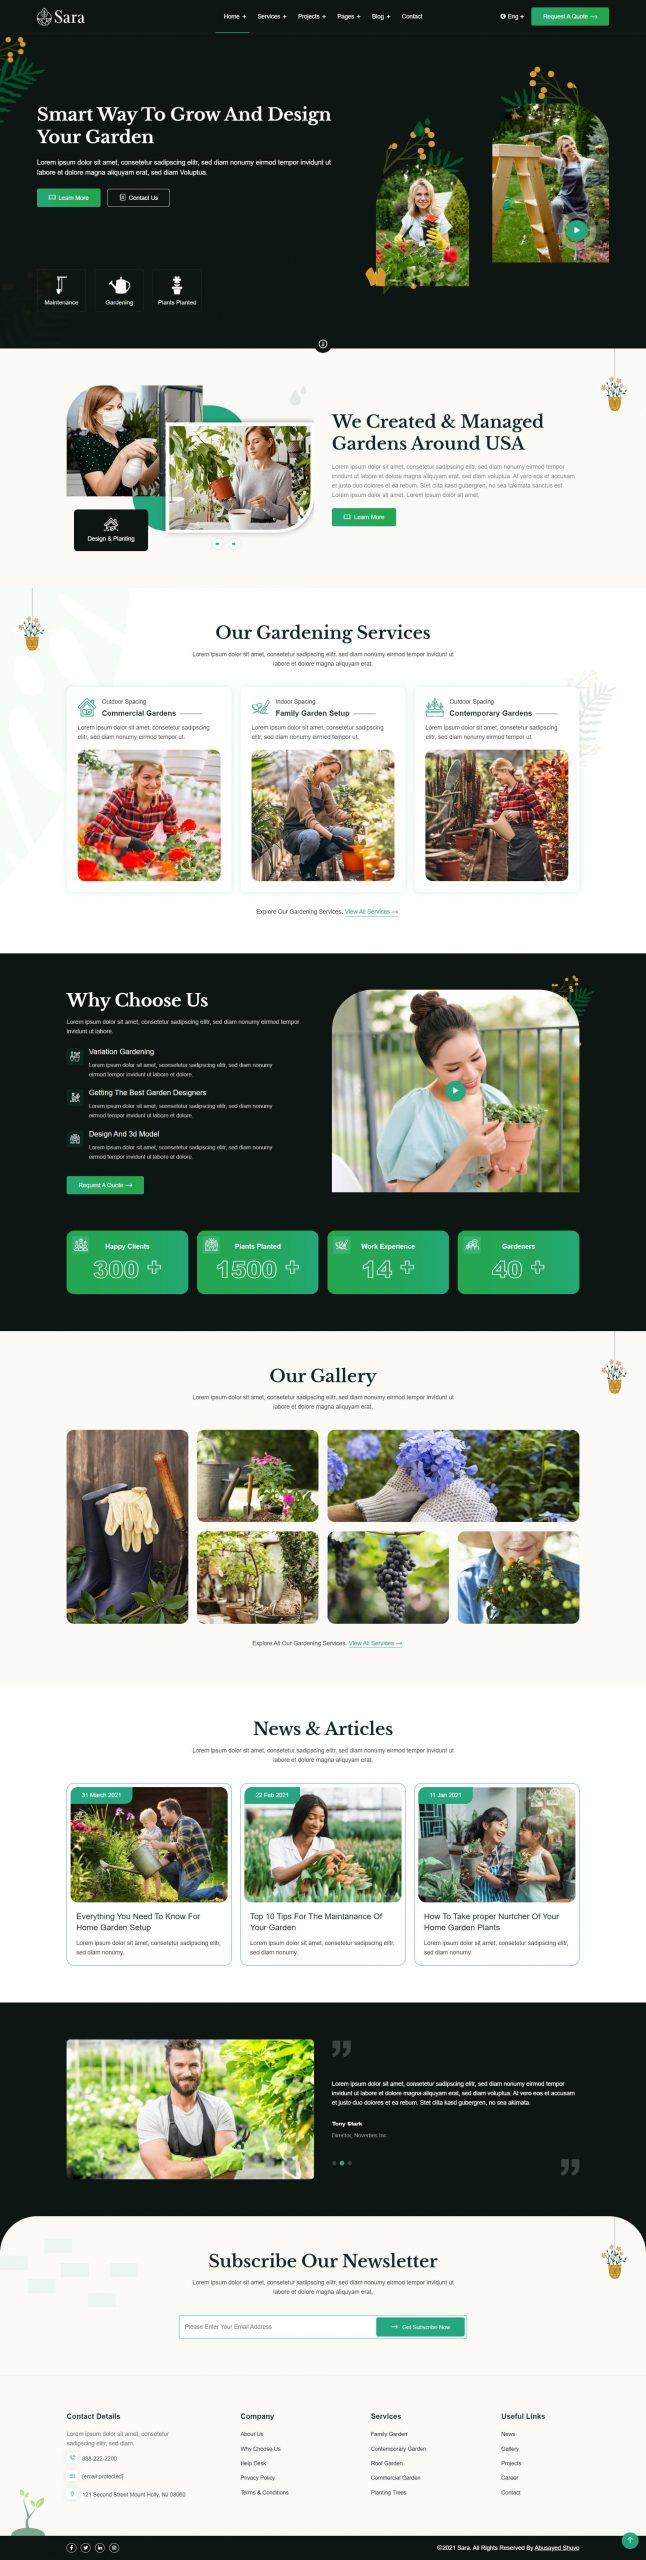 Sara - Garden Landscaper HTML Template